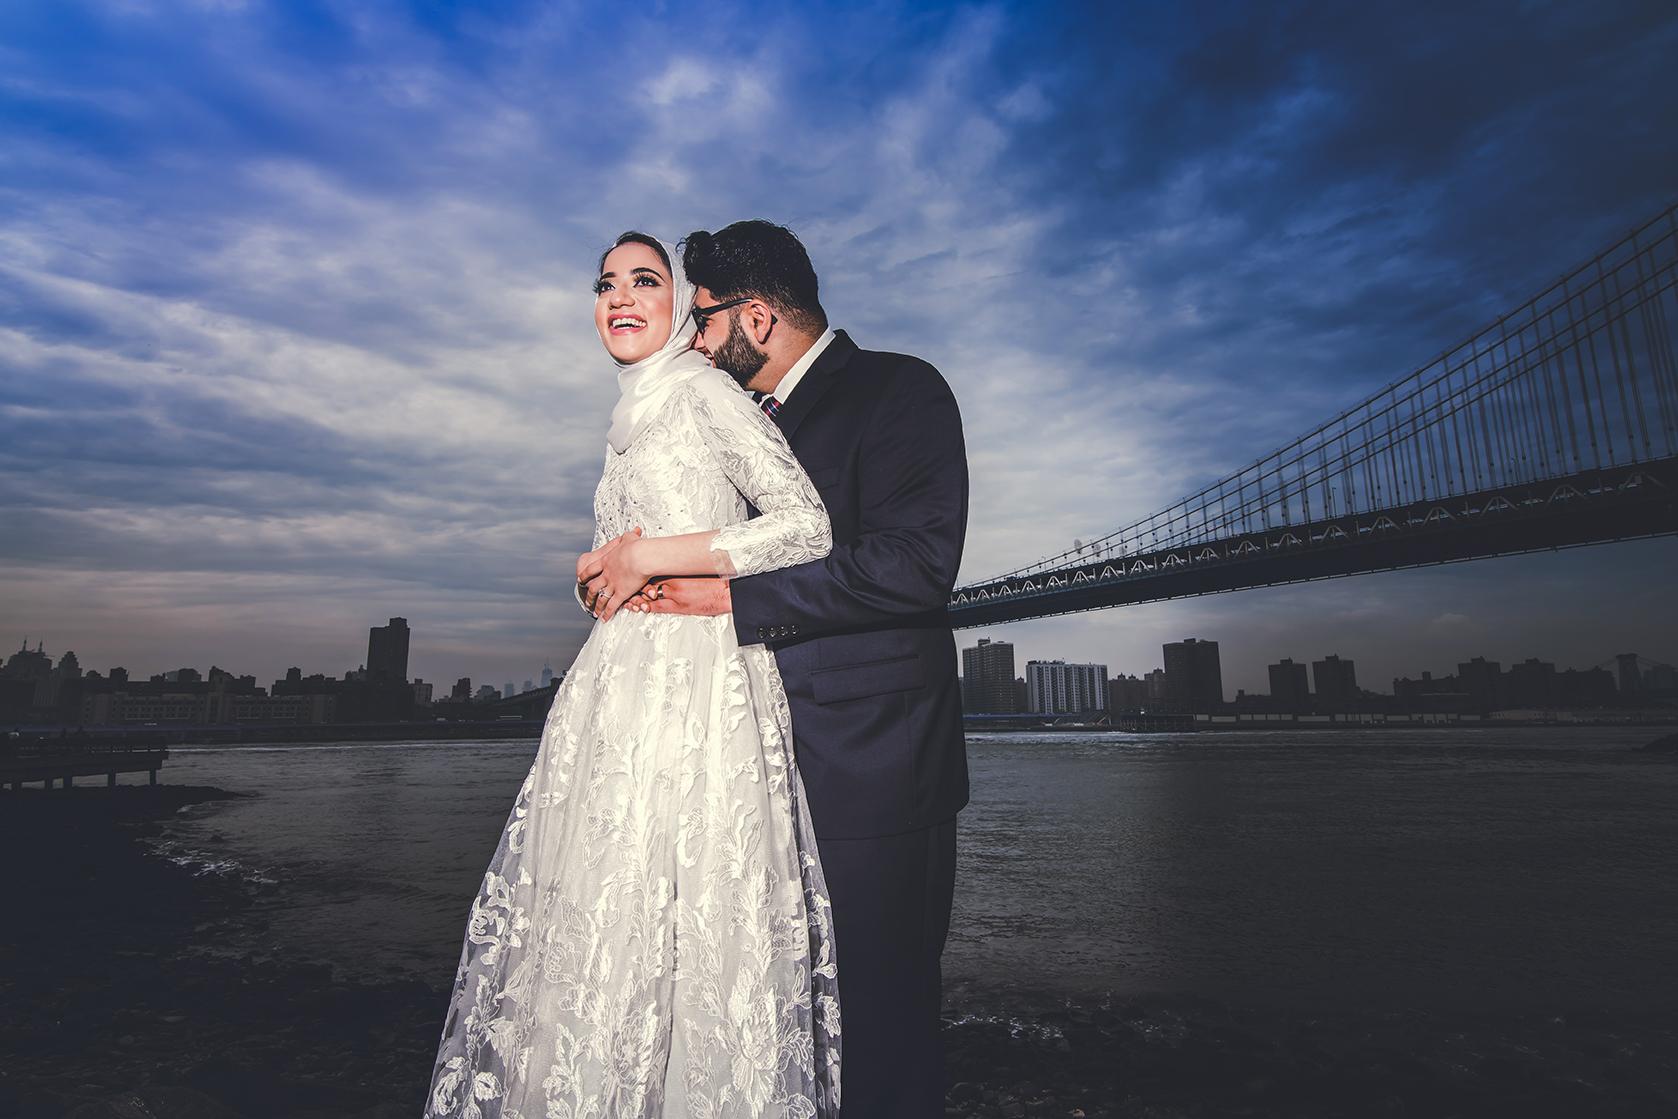 engagement_photography_dhoom_studio_new_york_63 ENGAGEMENTS